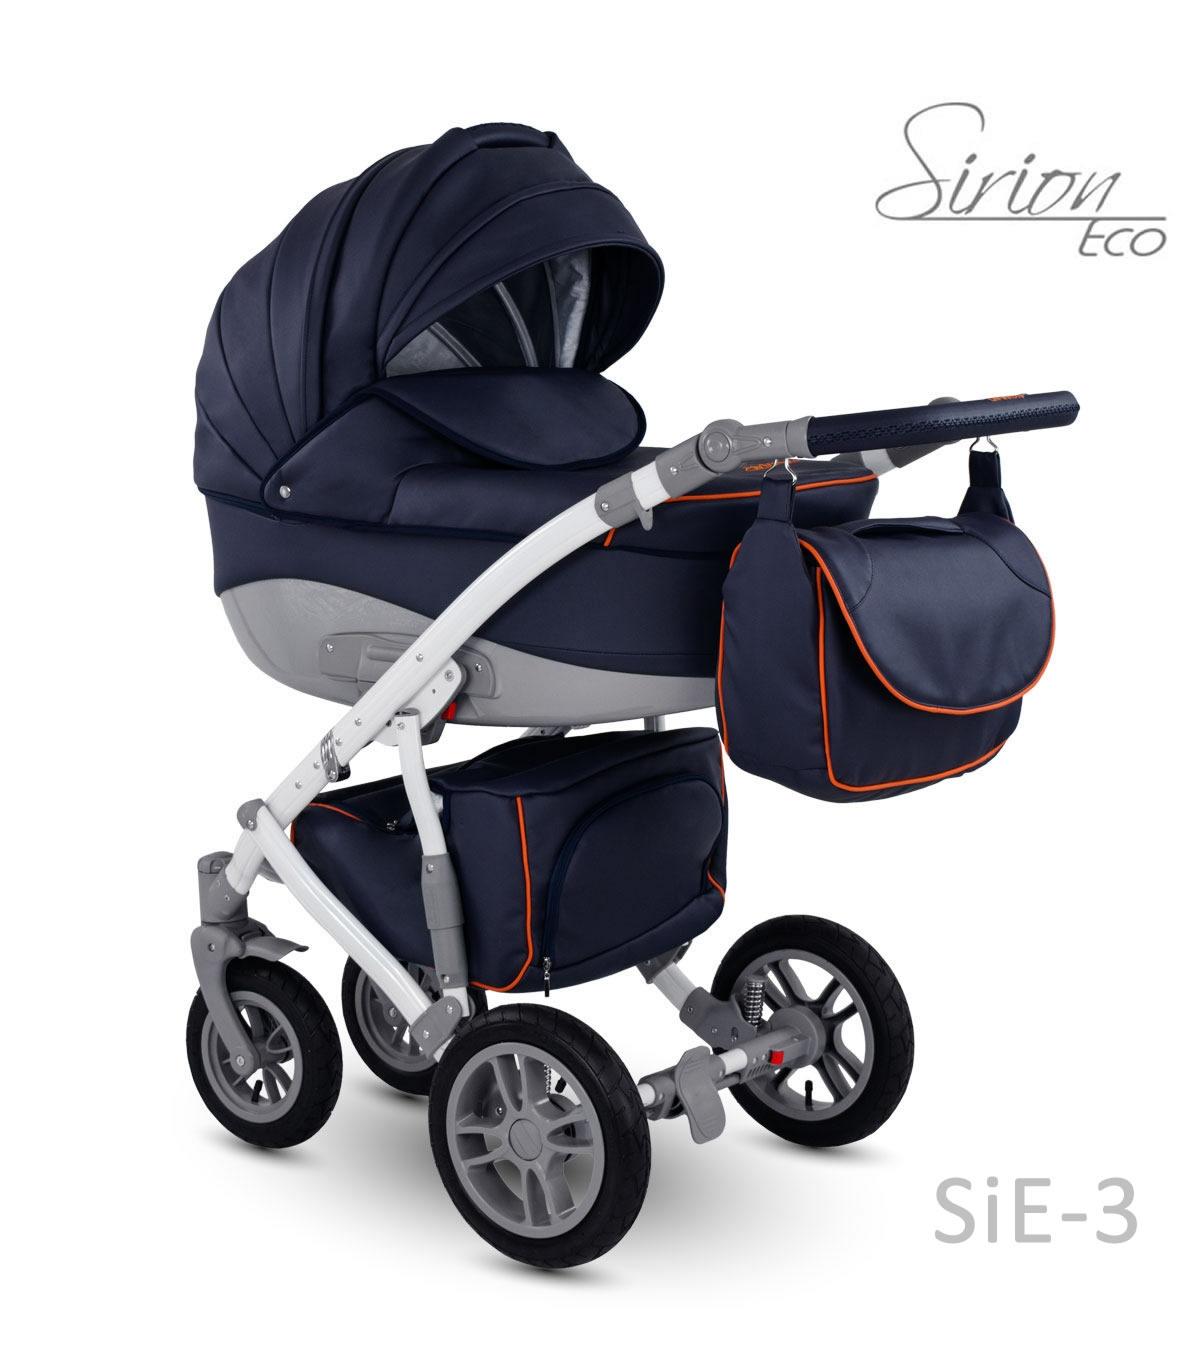 Carucior copii 3 in 1 Sirion Eco CAMARELO COLOR SIE-3